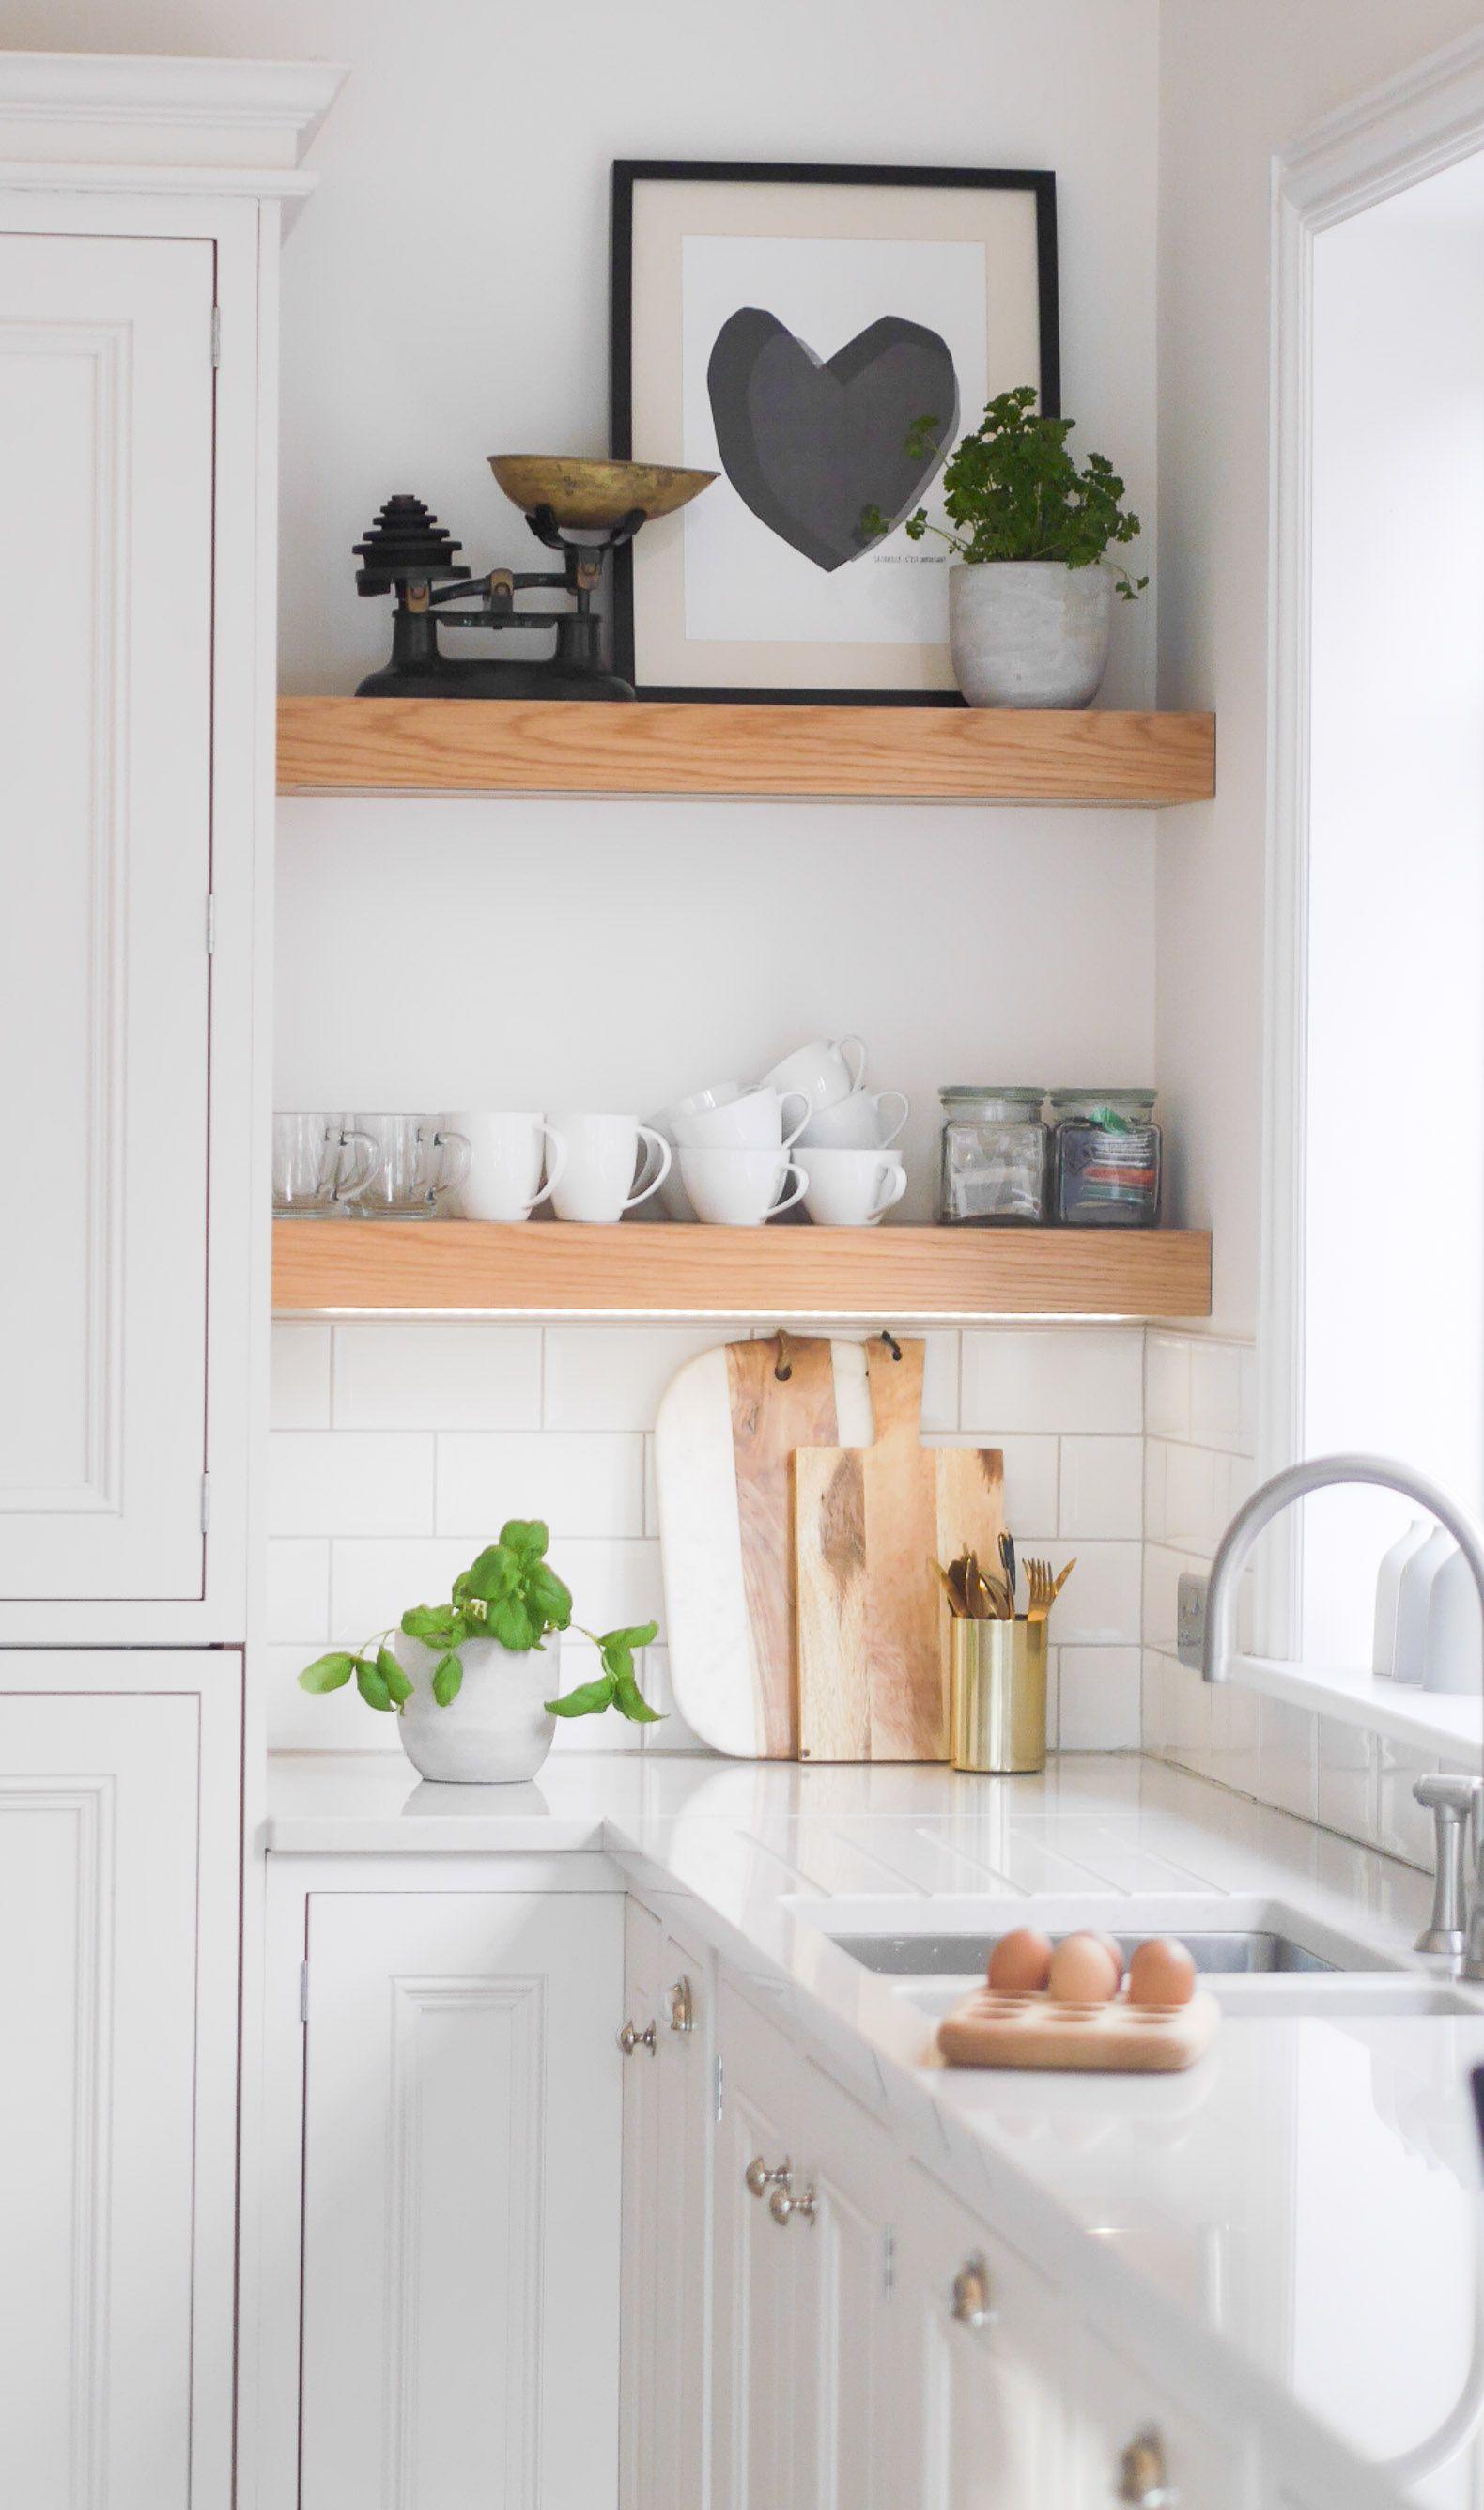 Kitchen design - home tour | Pinterest | Green eyed girls, Dining ...